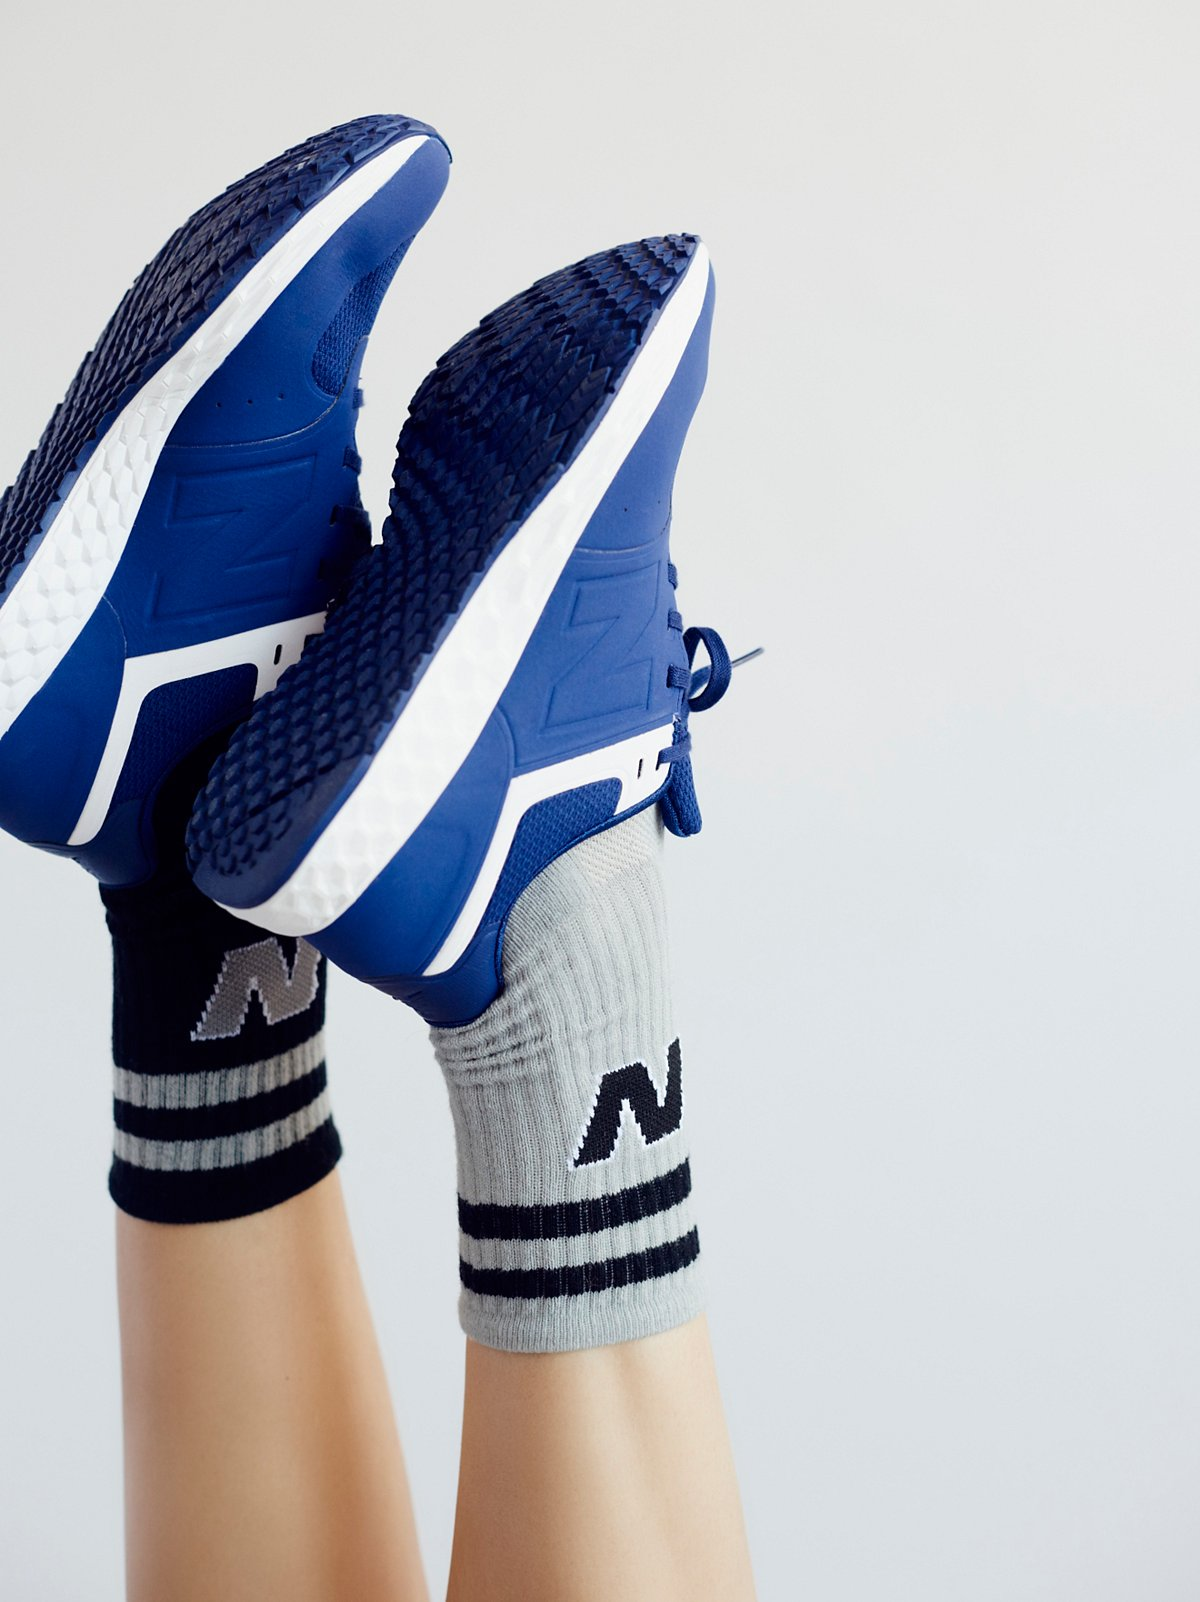 574 Mash-Up运动鞋